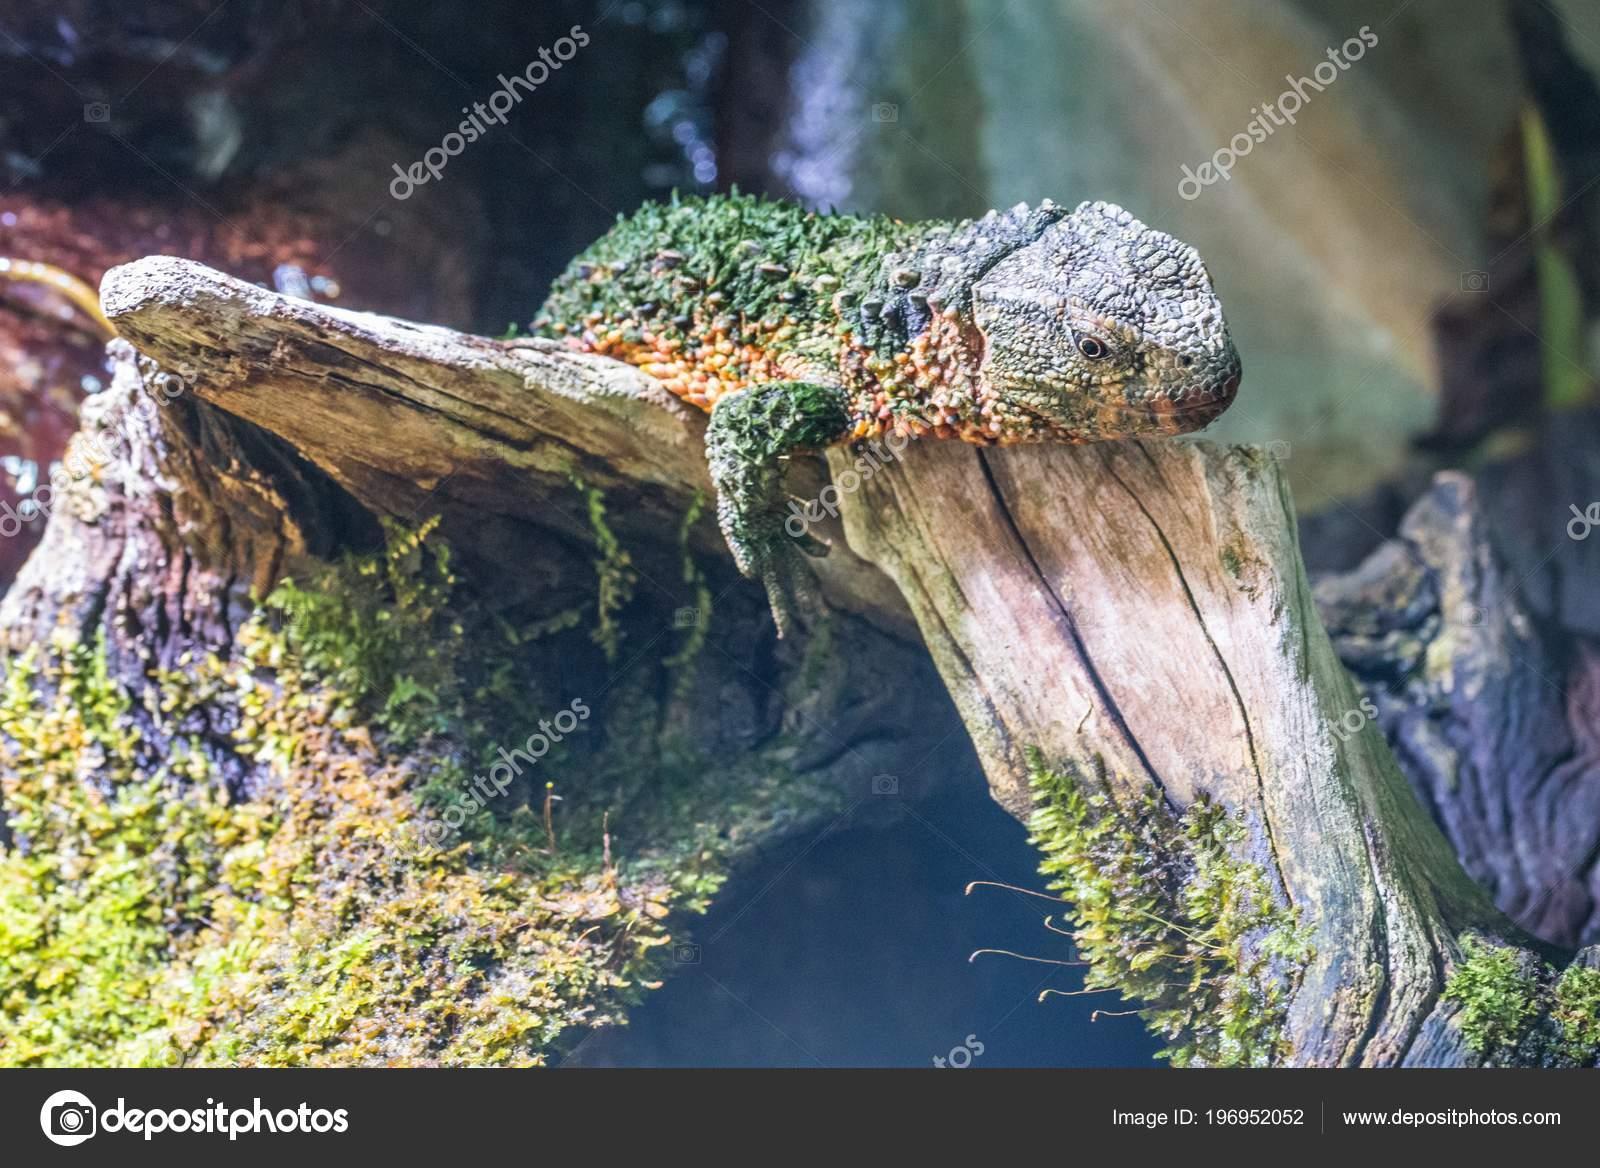 Crocodile Lizard Terrarium Stock Photo C Thomas Koschnick Gmx De